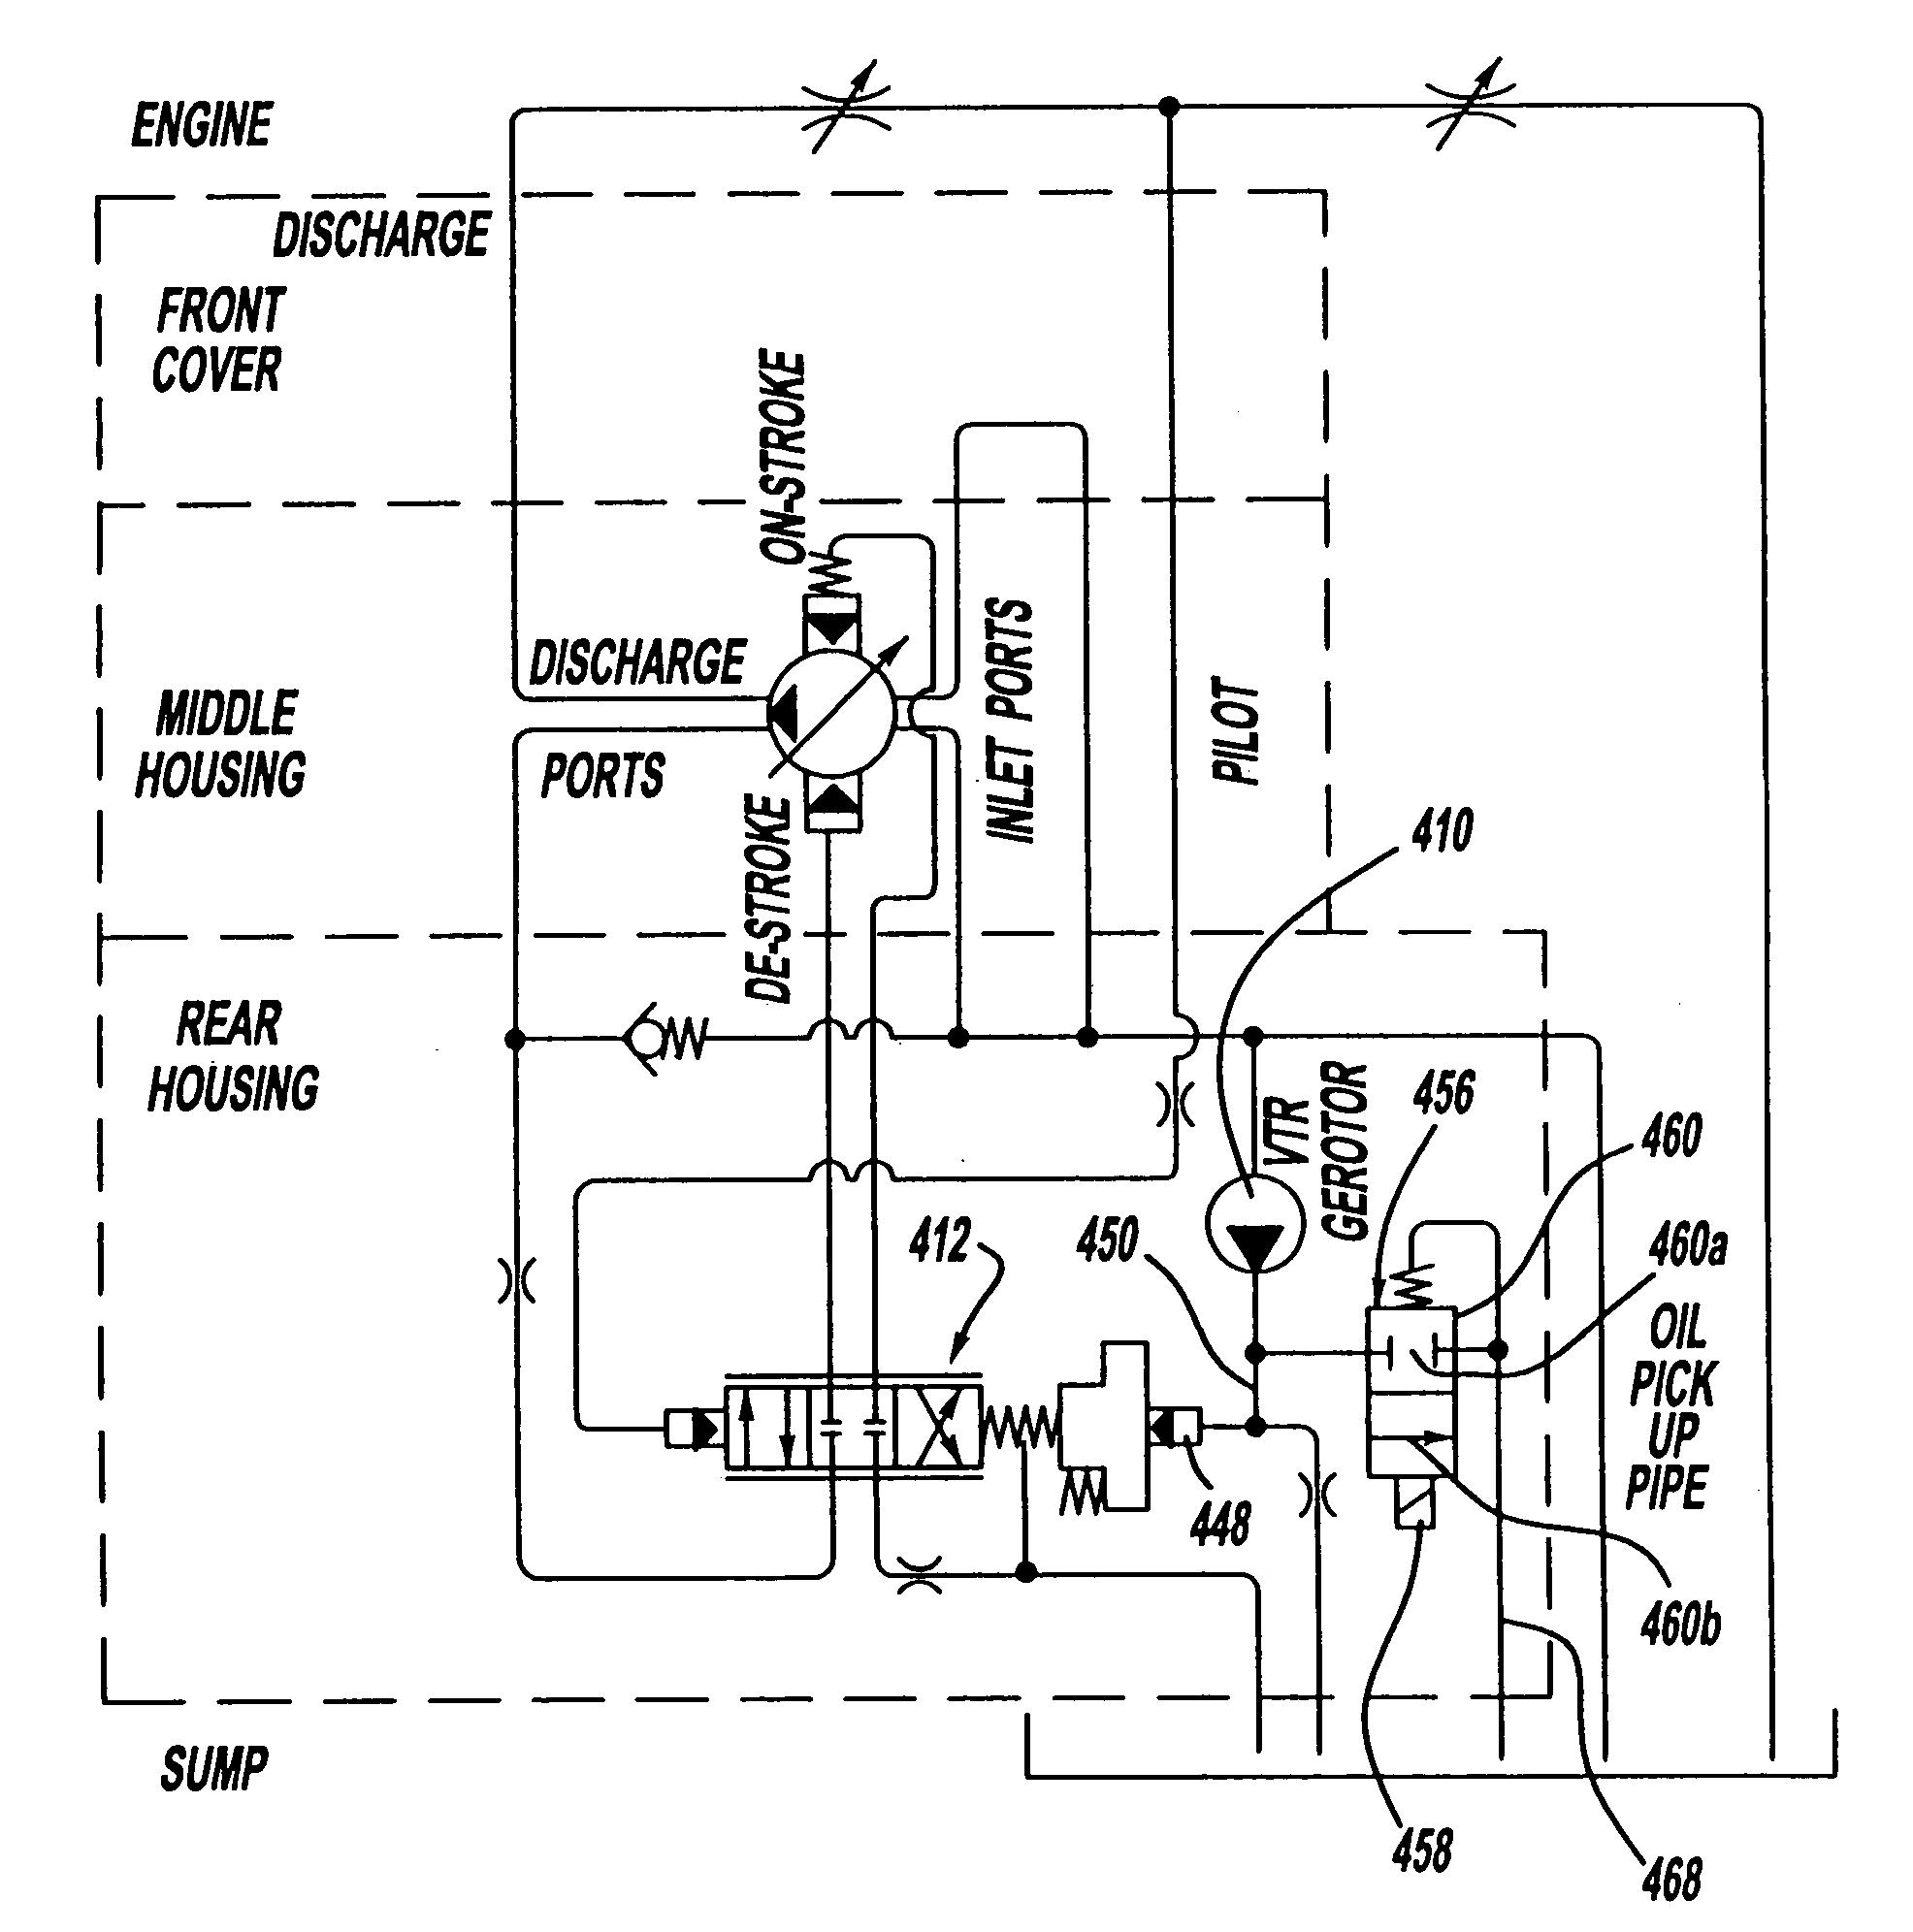 engine lubrication system oil pressure  engine  free